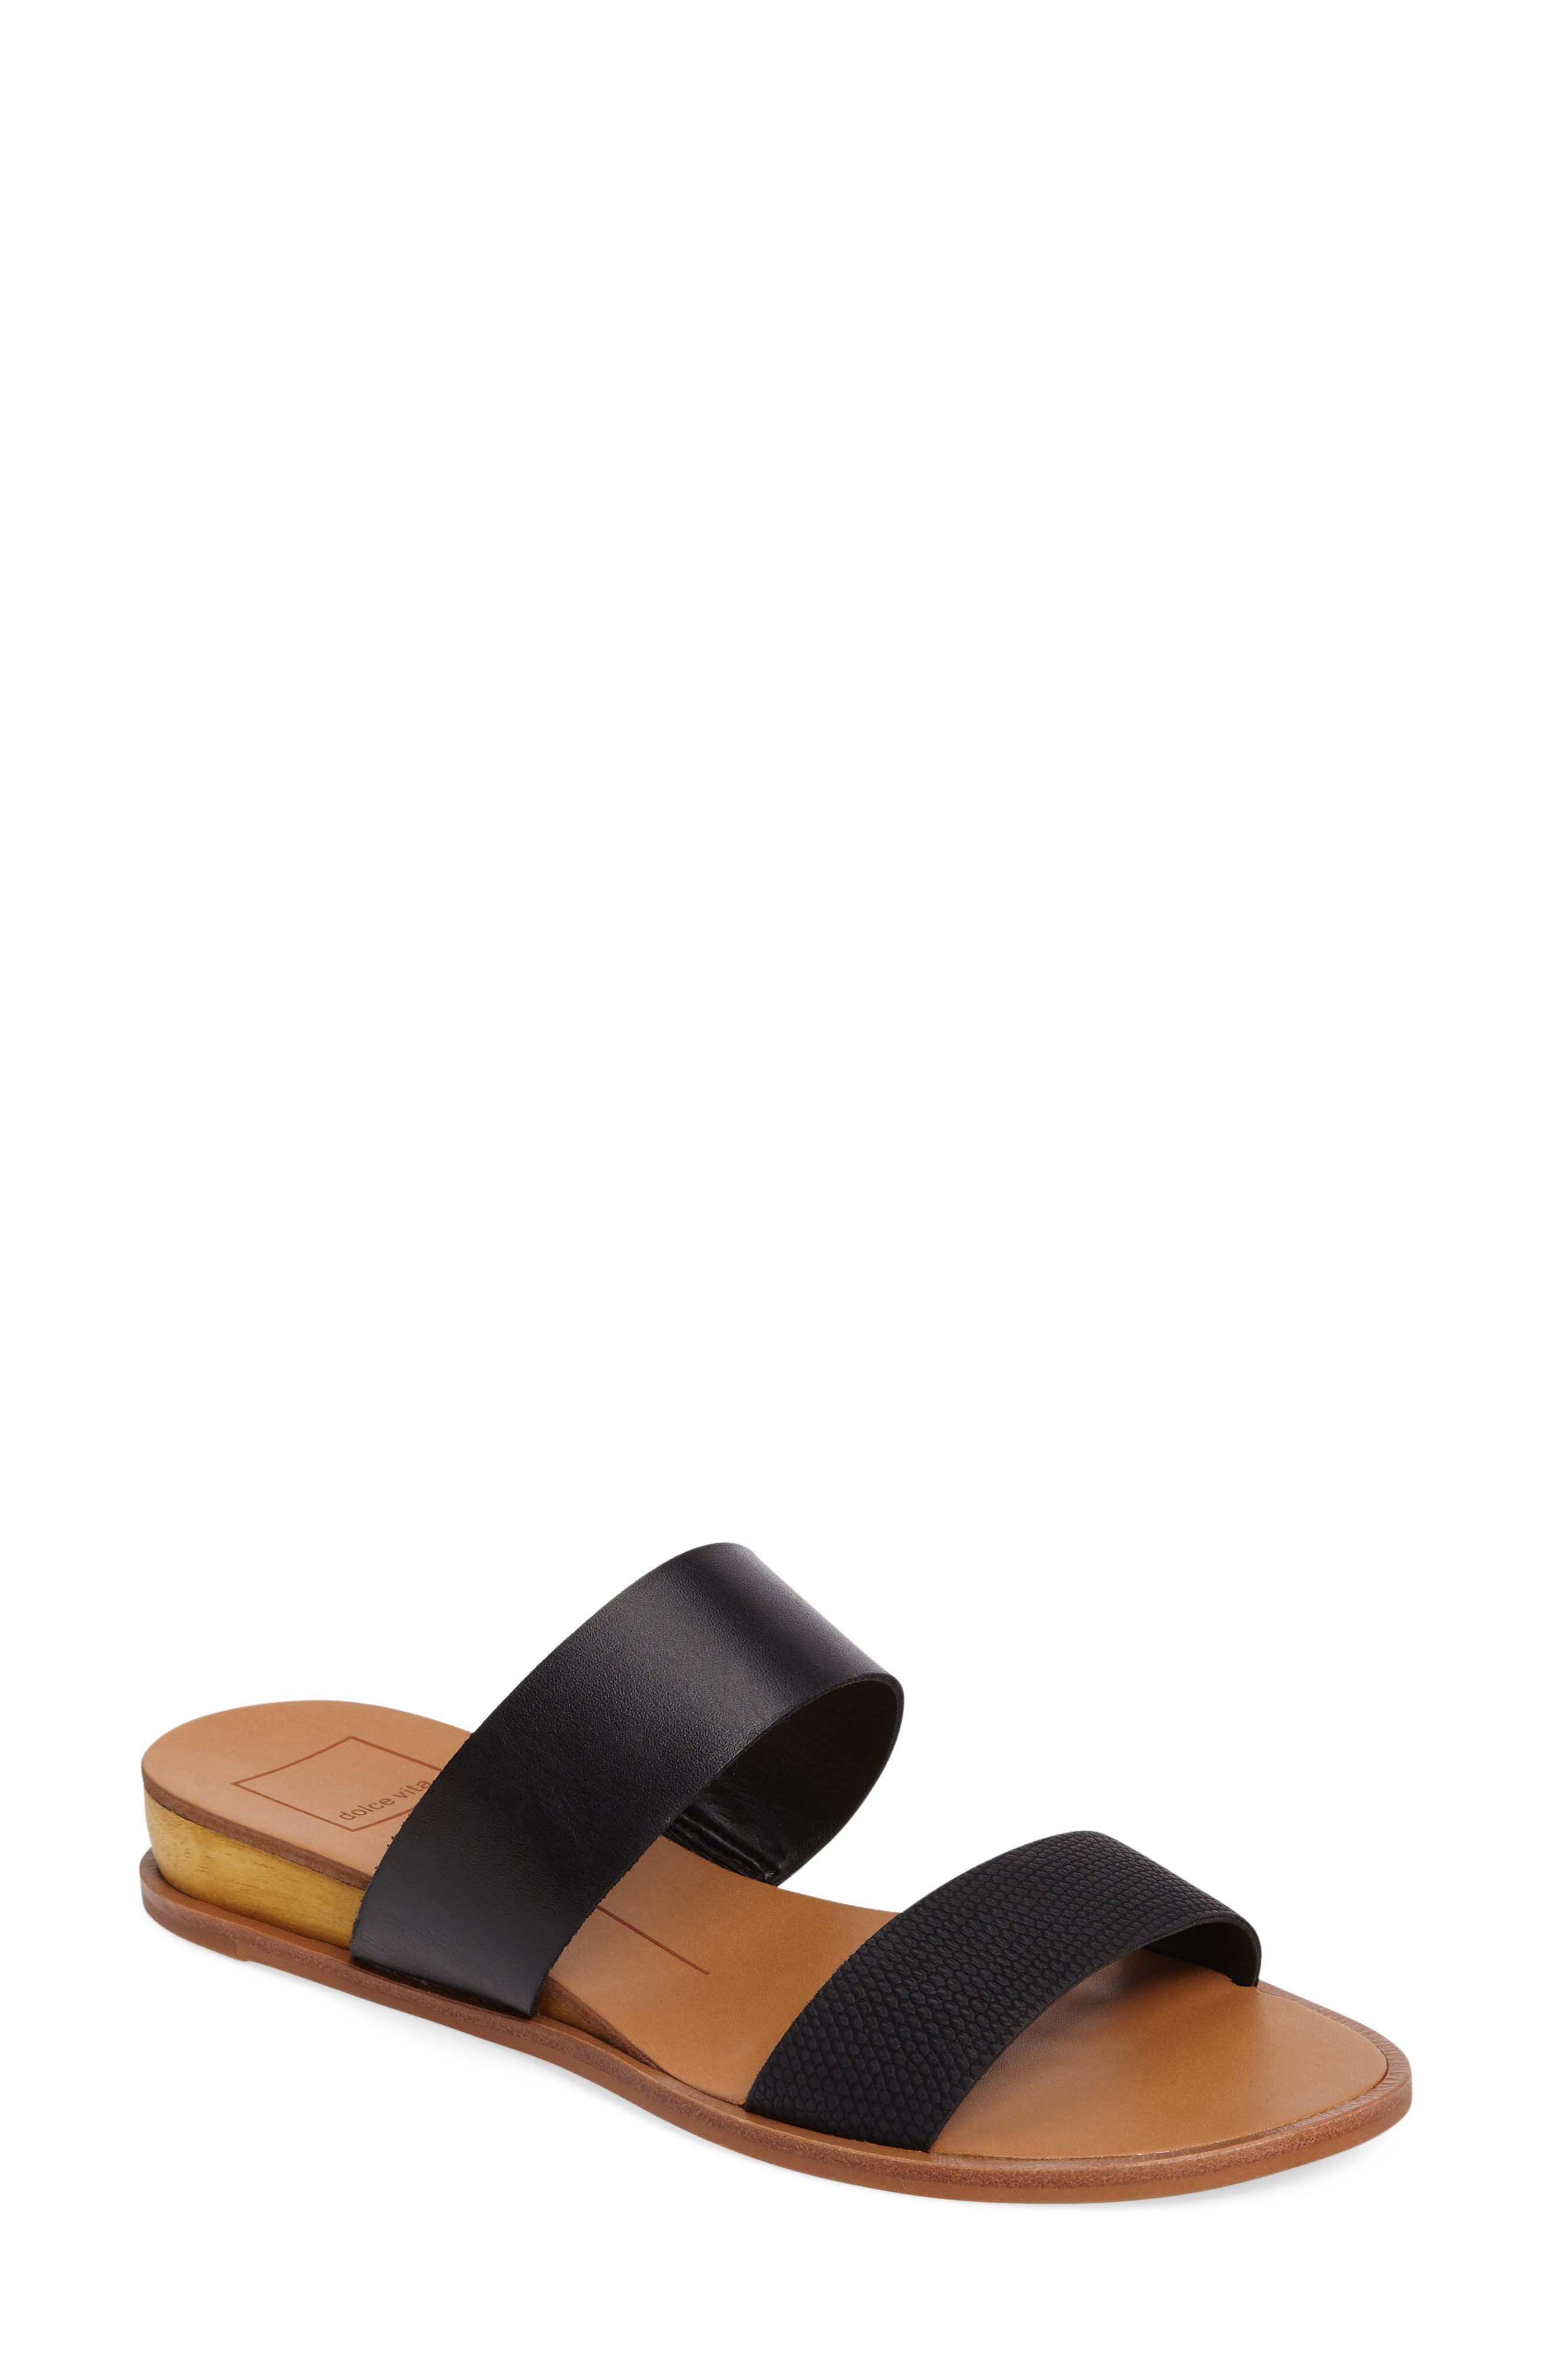 Main Image - Dolce Vita 'Payce' Slide Sandal (Women)